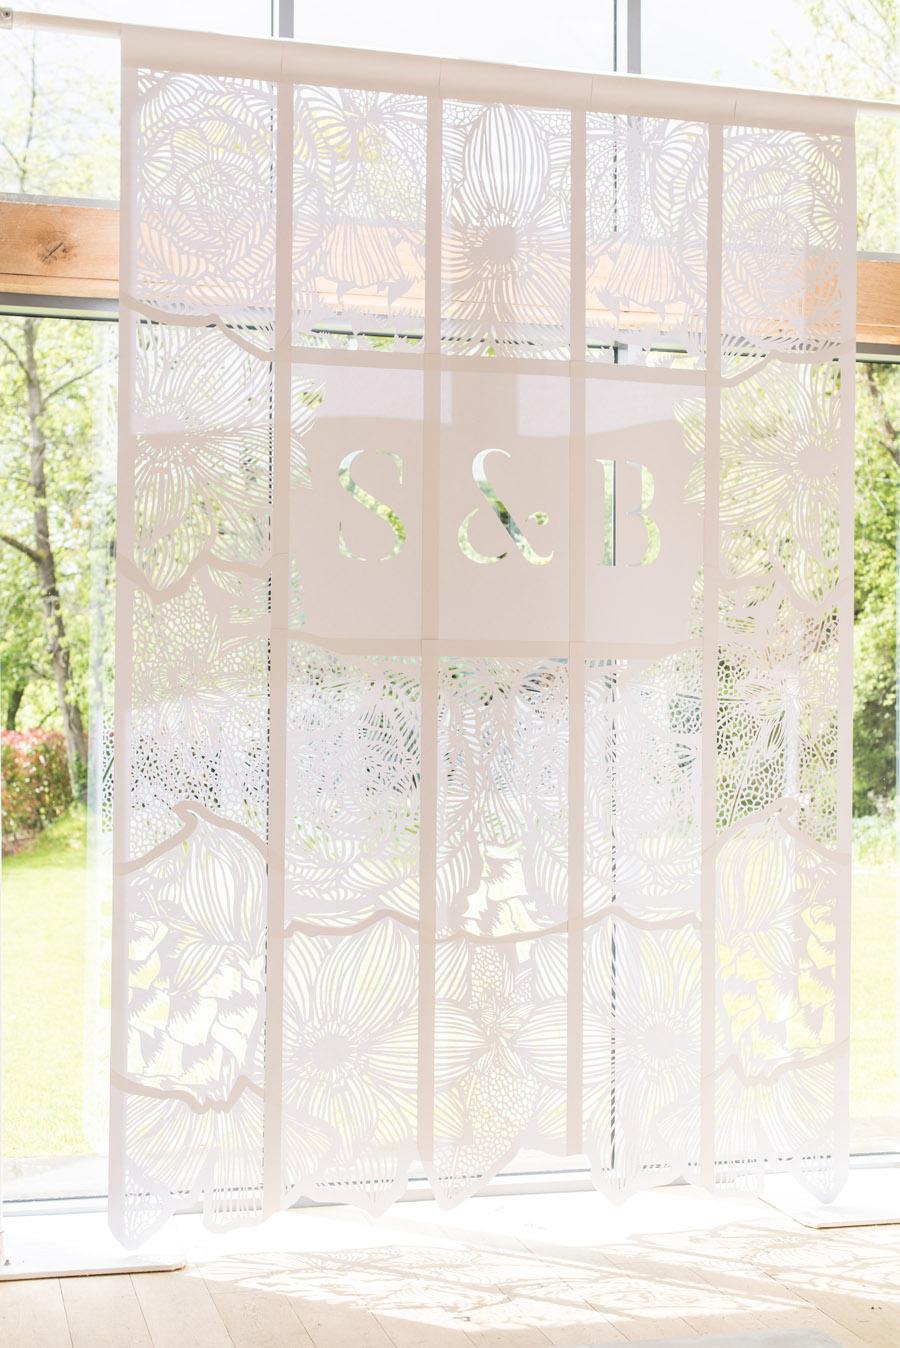 floral wedding ideas at Millbridge Court on English Wedding - photo credit Julie Michaelsen Photography (4)